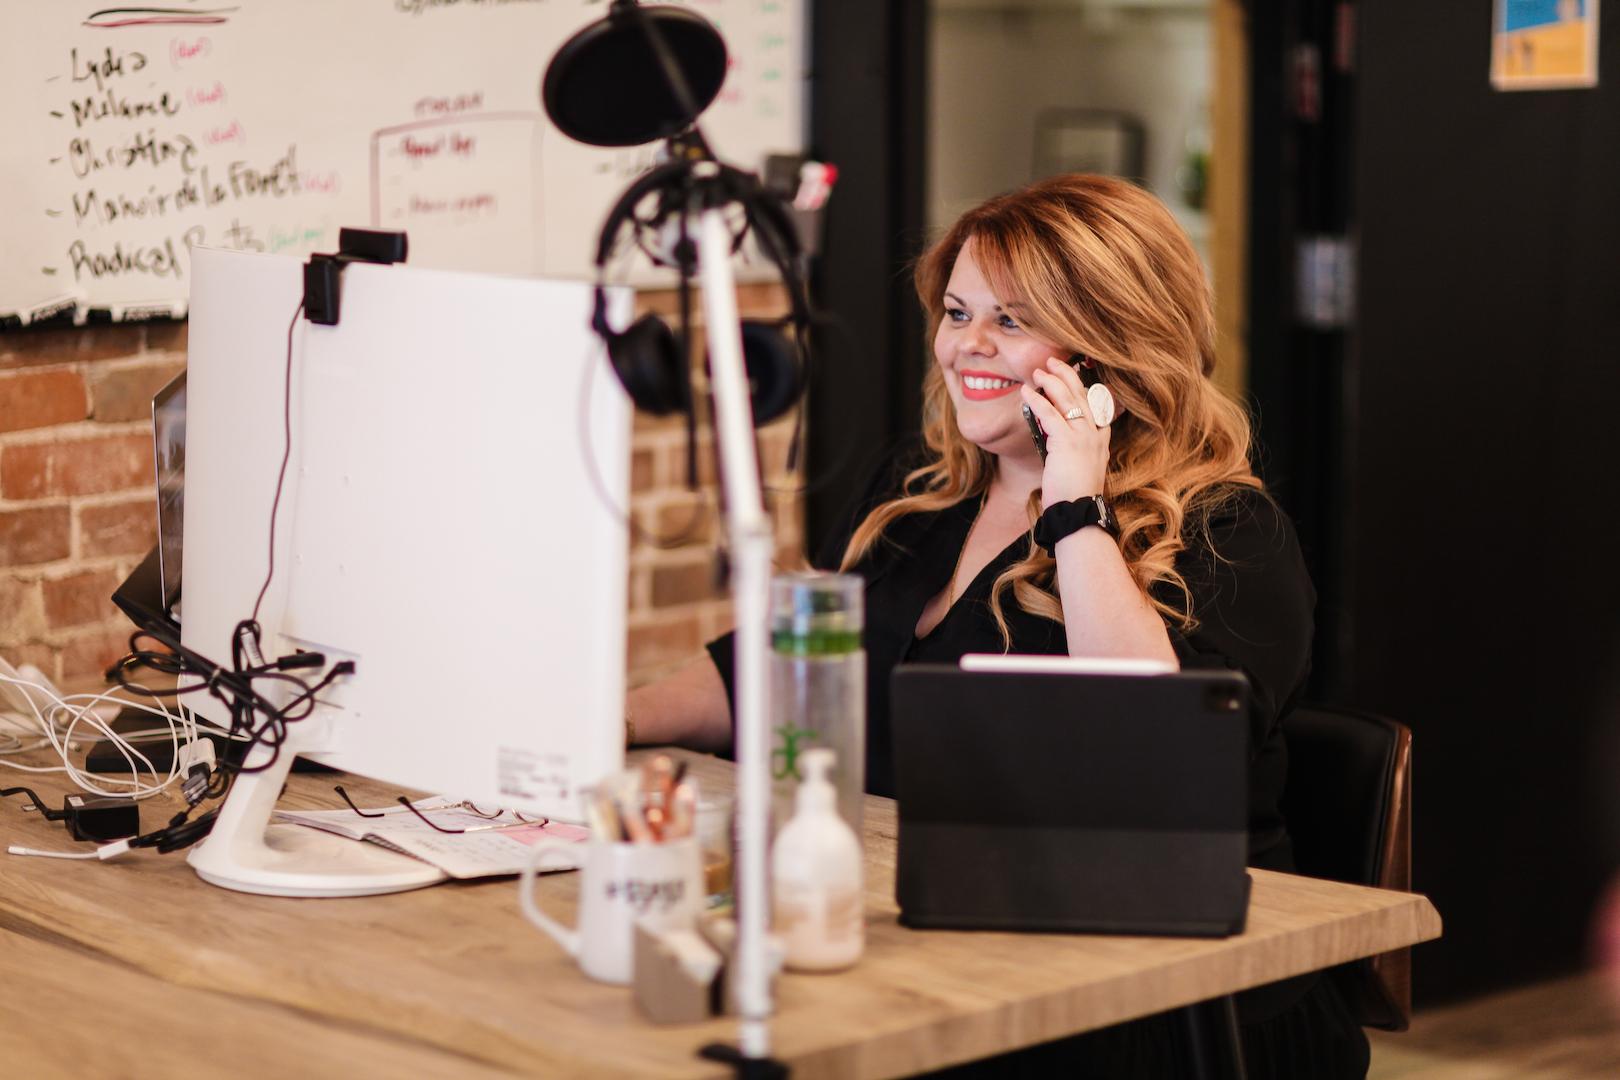 Karine Parthenais on phone call with client